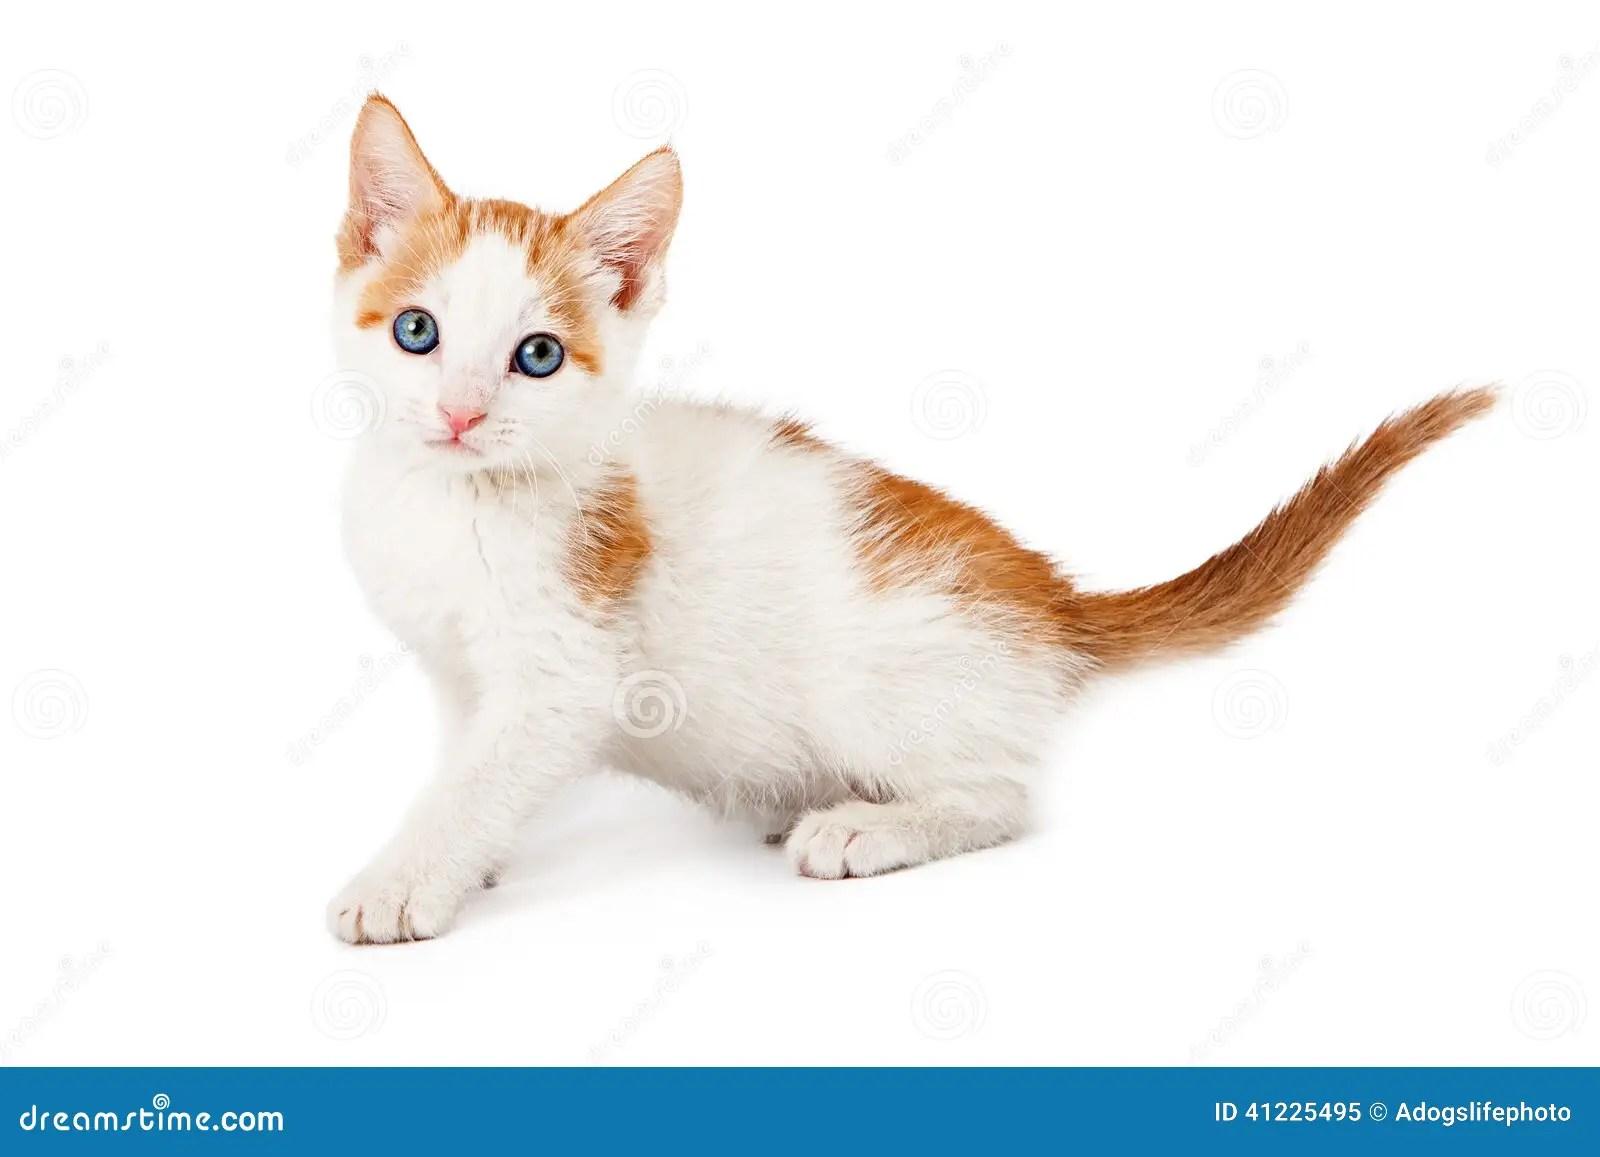 Kitten Orange And White Looking At Camera Stock Image